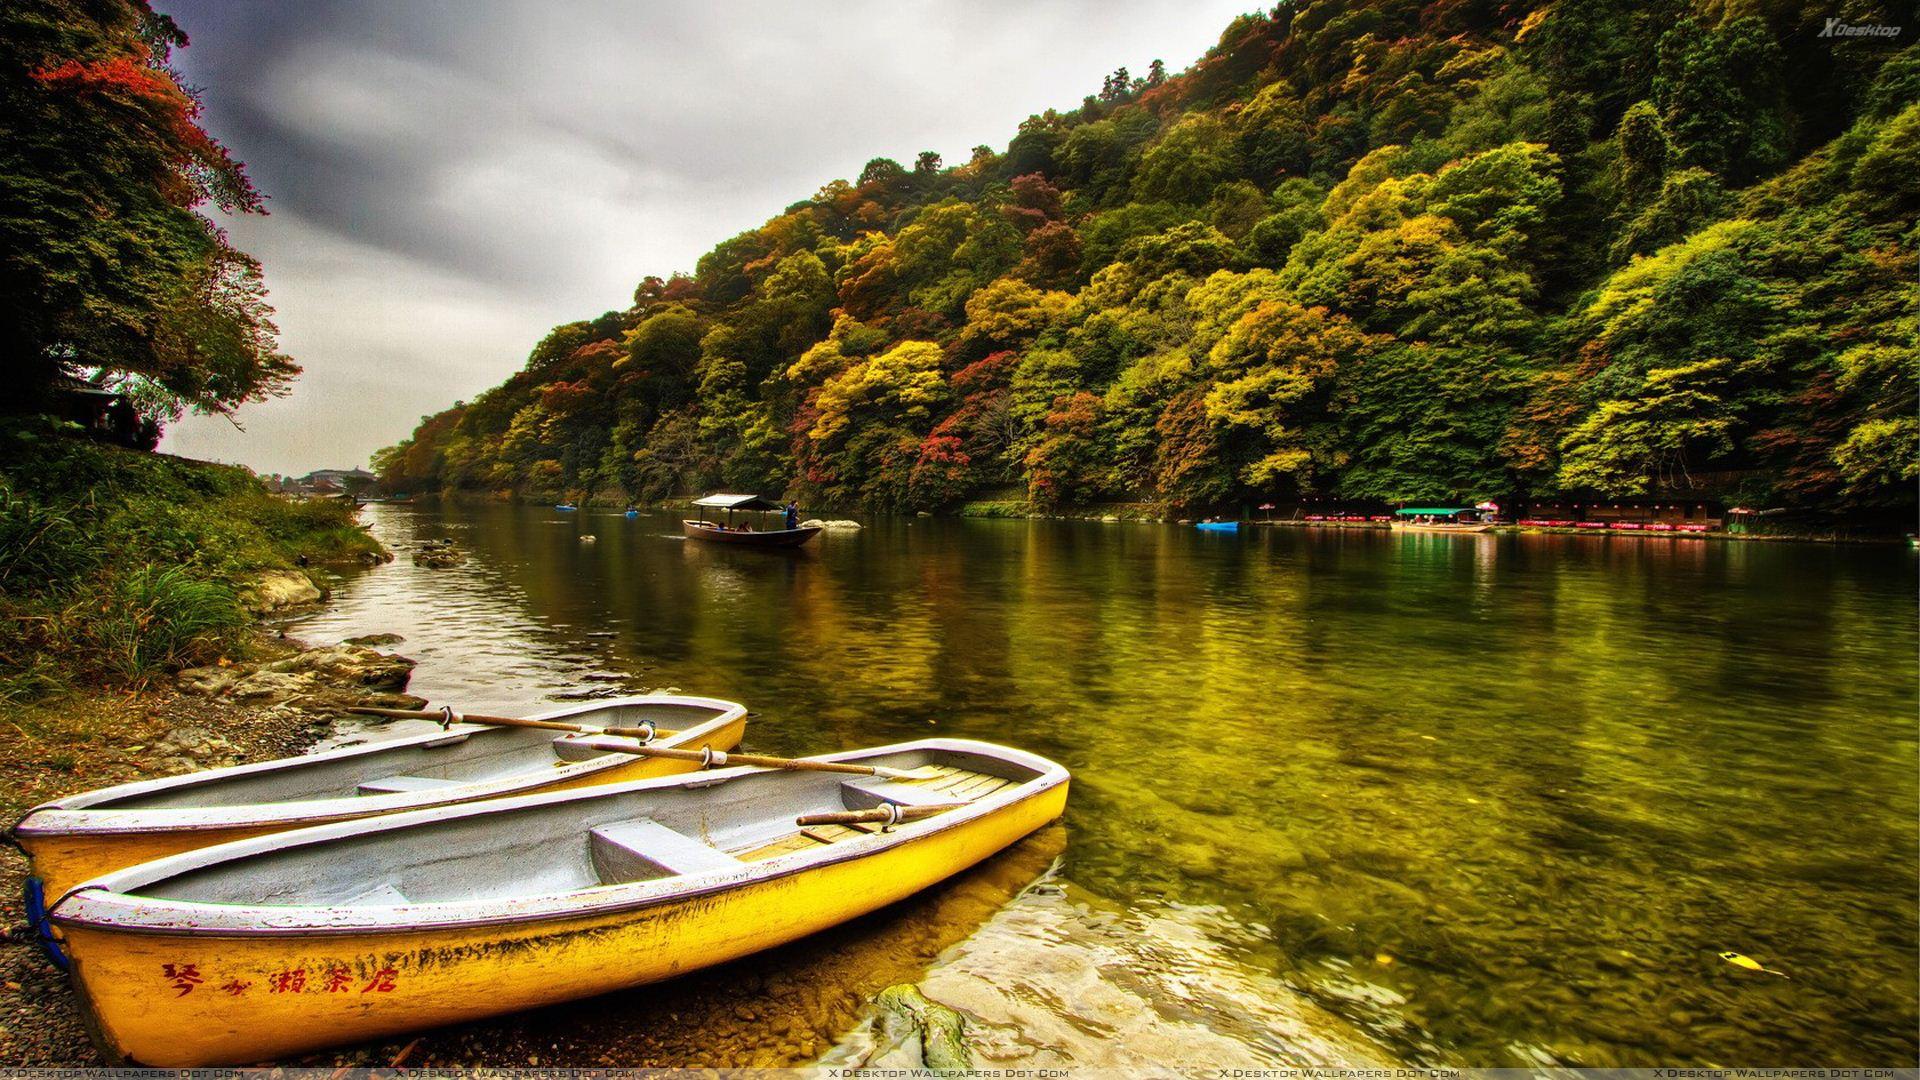 river nature hd wallpapers beautiful desktop images widescreen